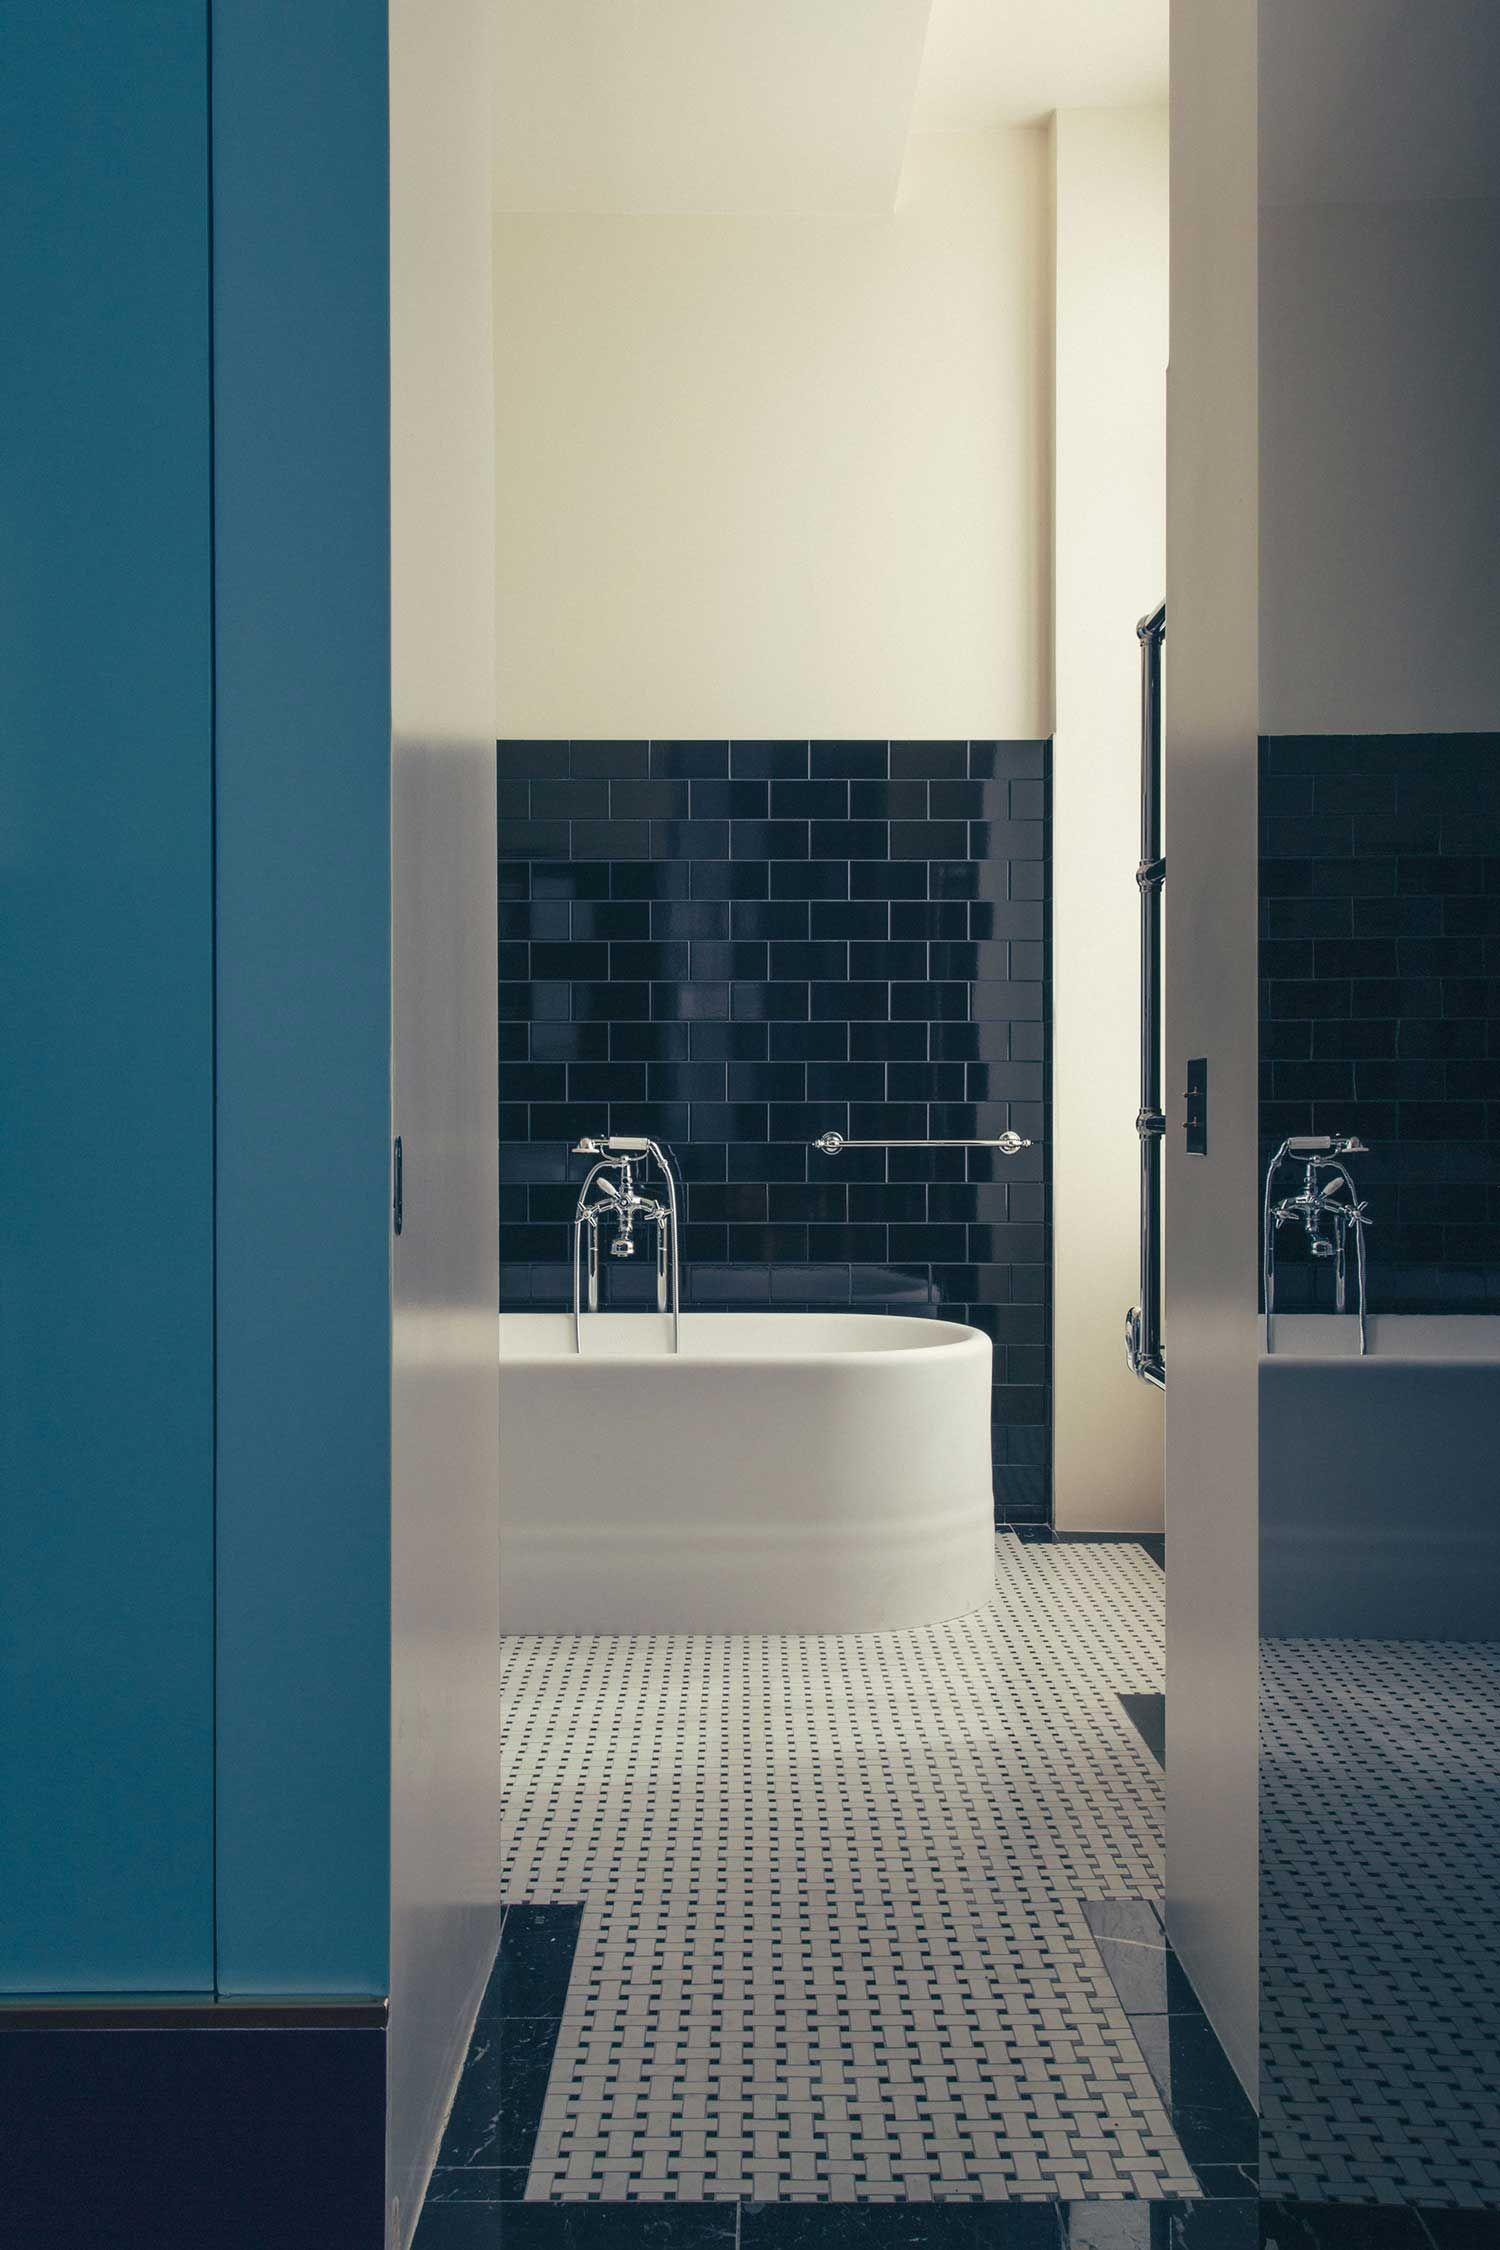 Hotel Saint Marc Paris By Dimore Studio | Yellowtrace Art Deco Hotel, Ikea  Pax